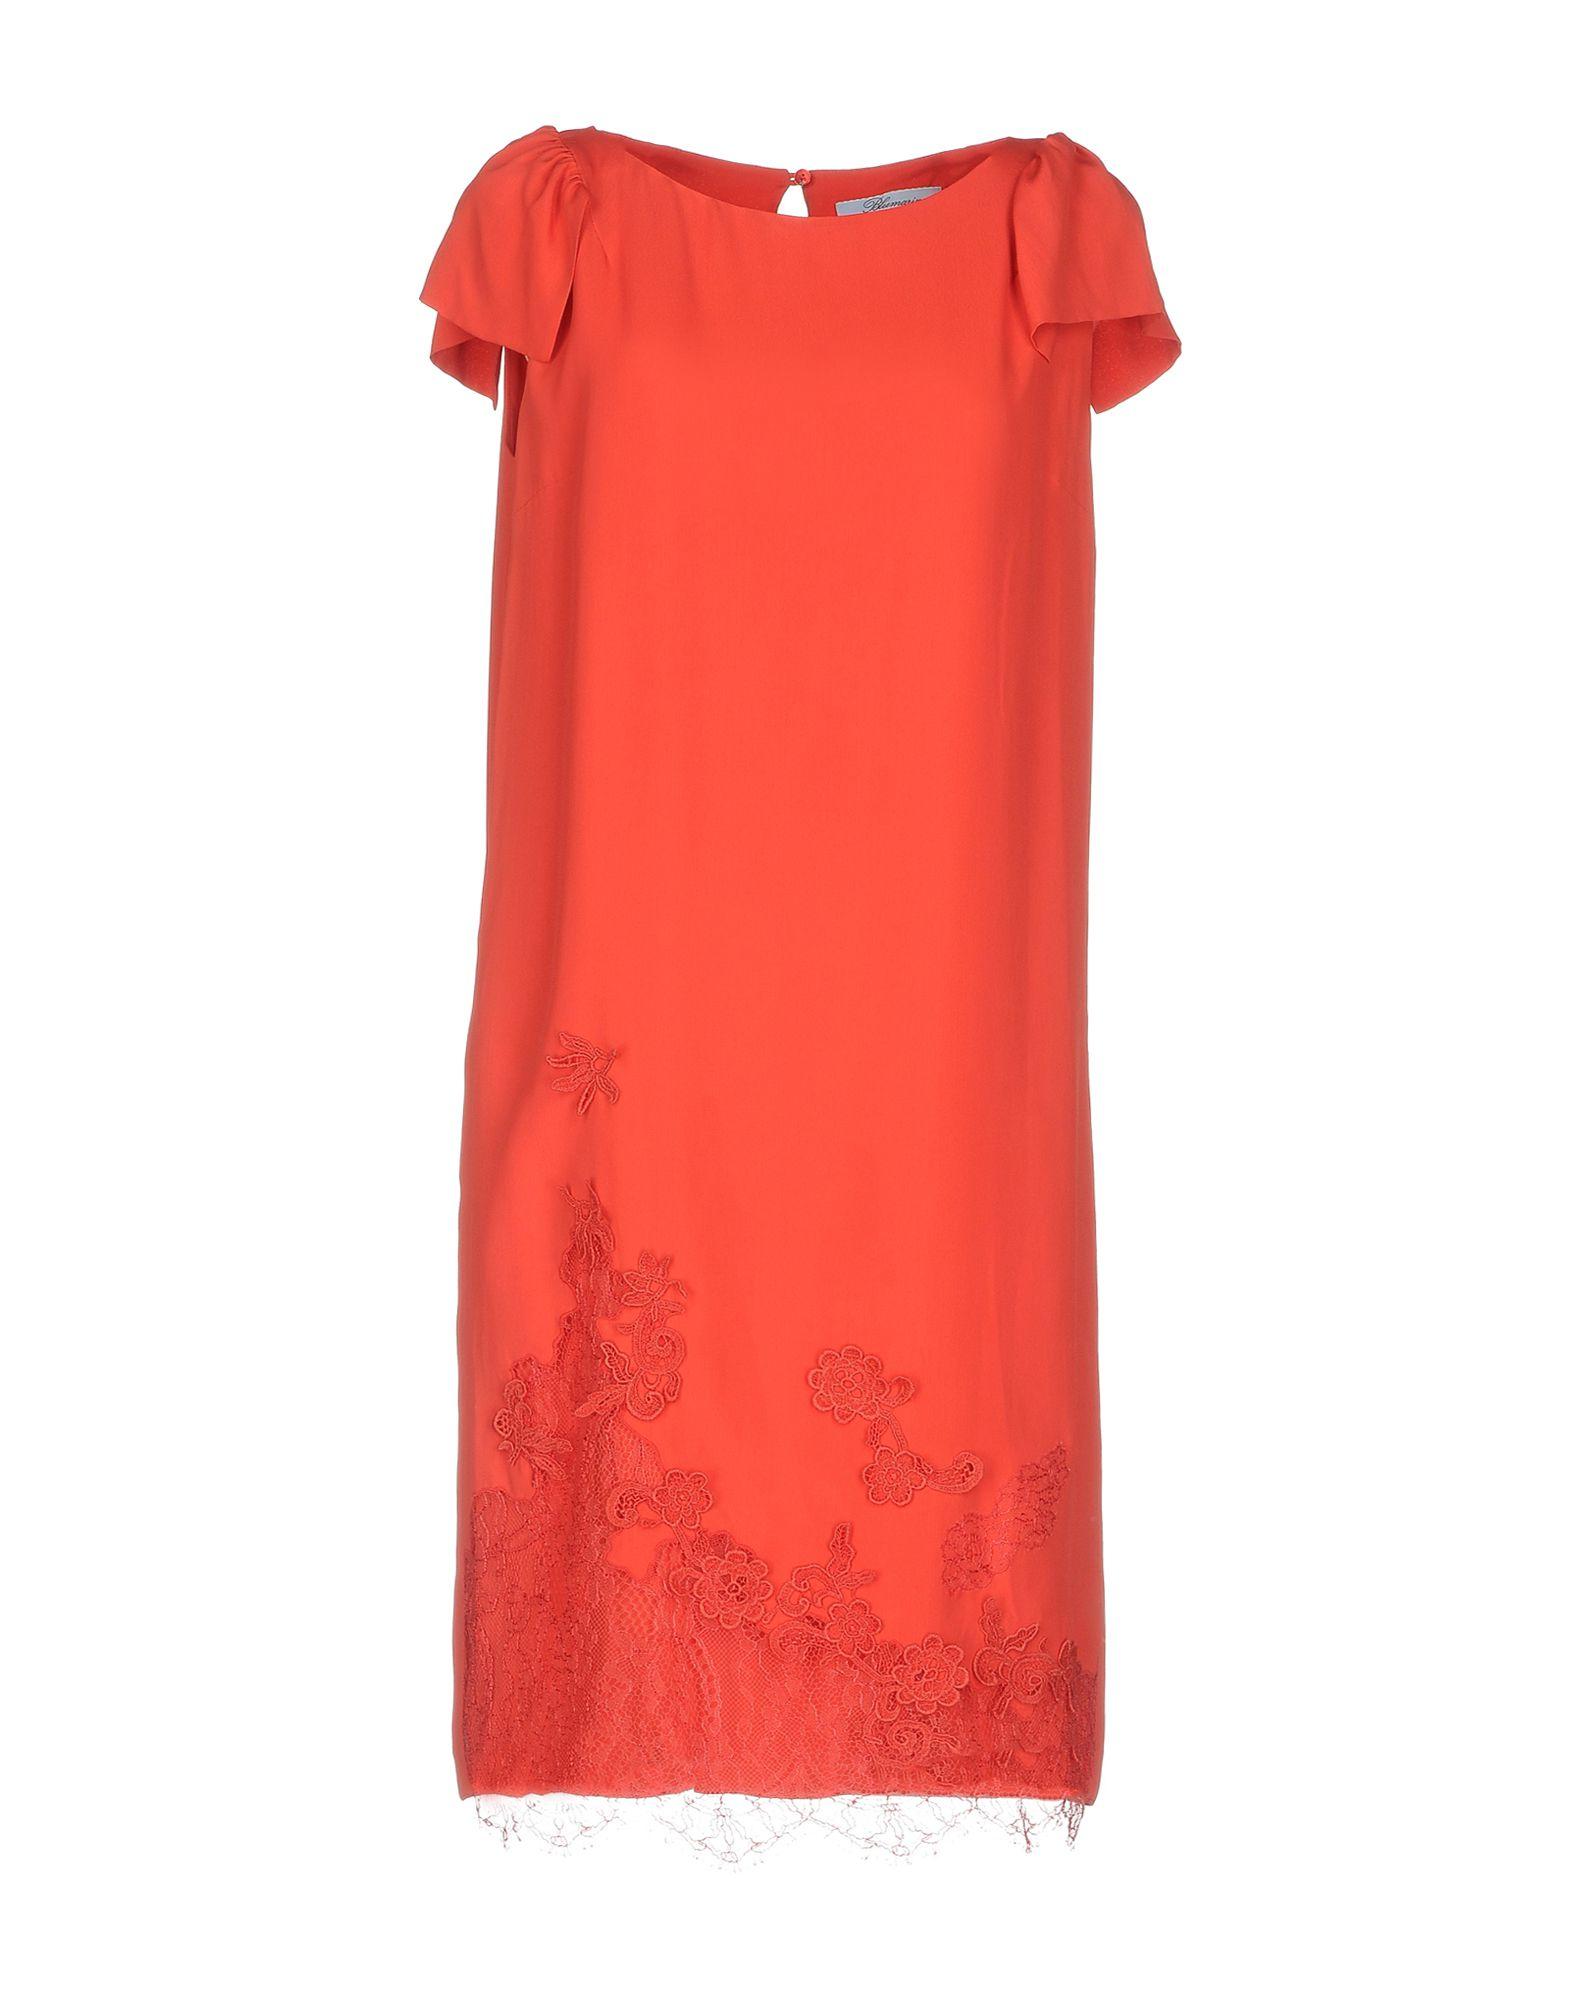 BLUMARINE Платье до колена 2225066030 high quality maf 22250 66030 mass air flow sensor for toyota 22250 66030 22250 66010